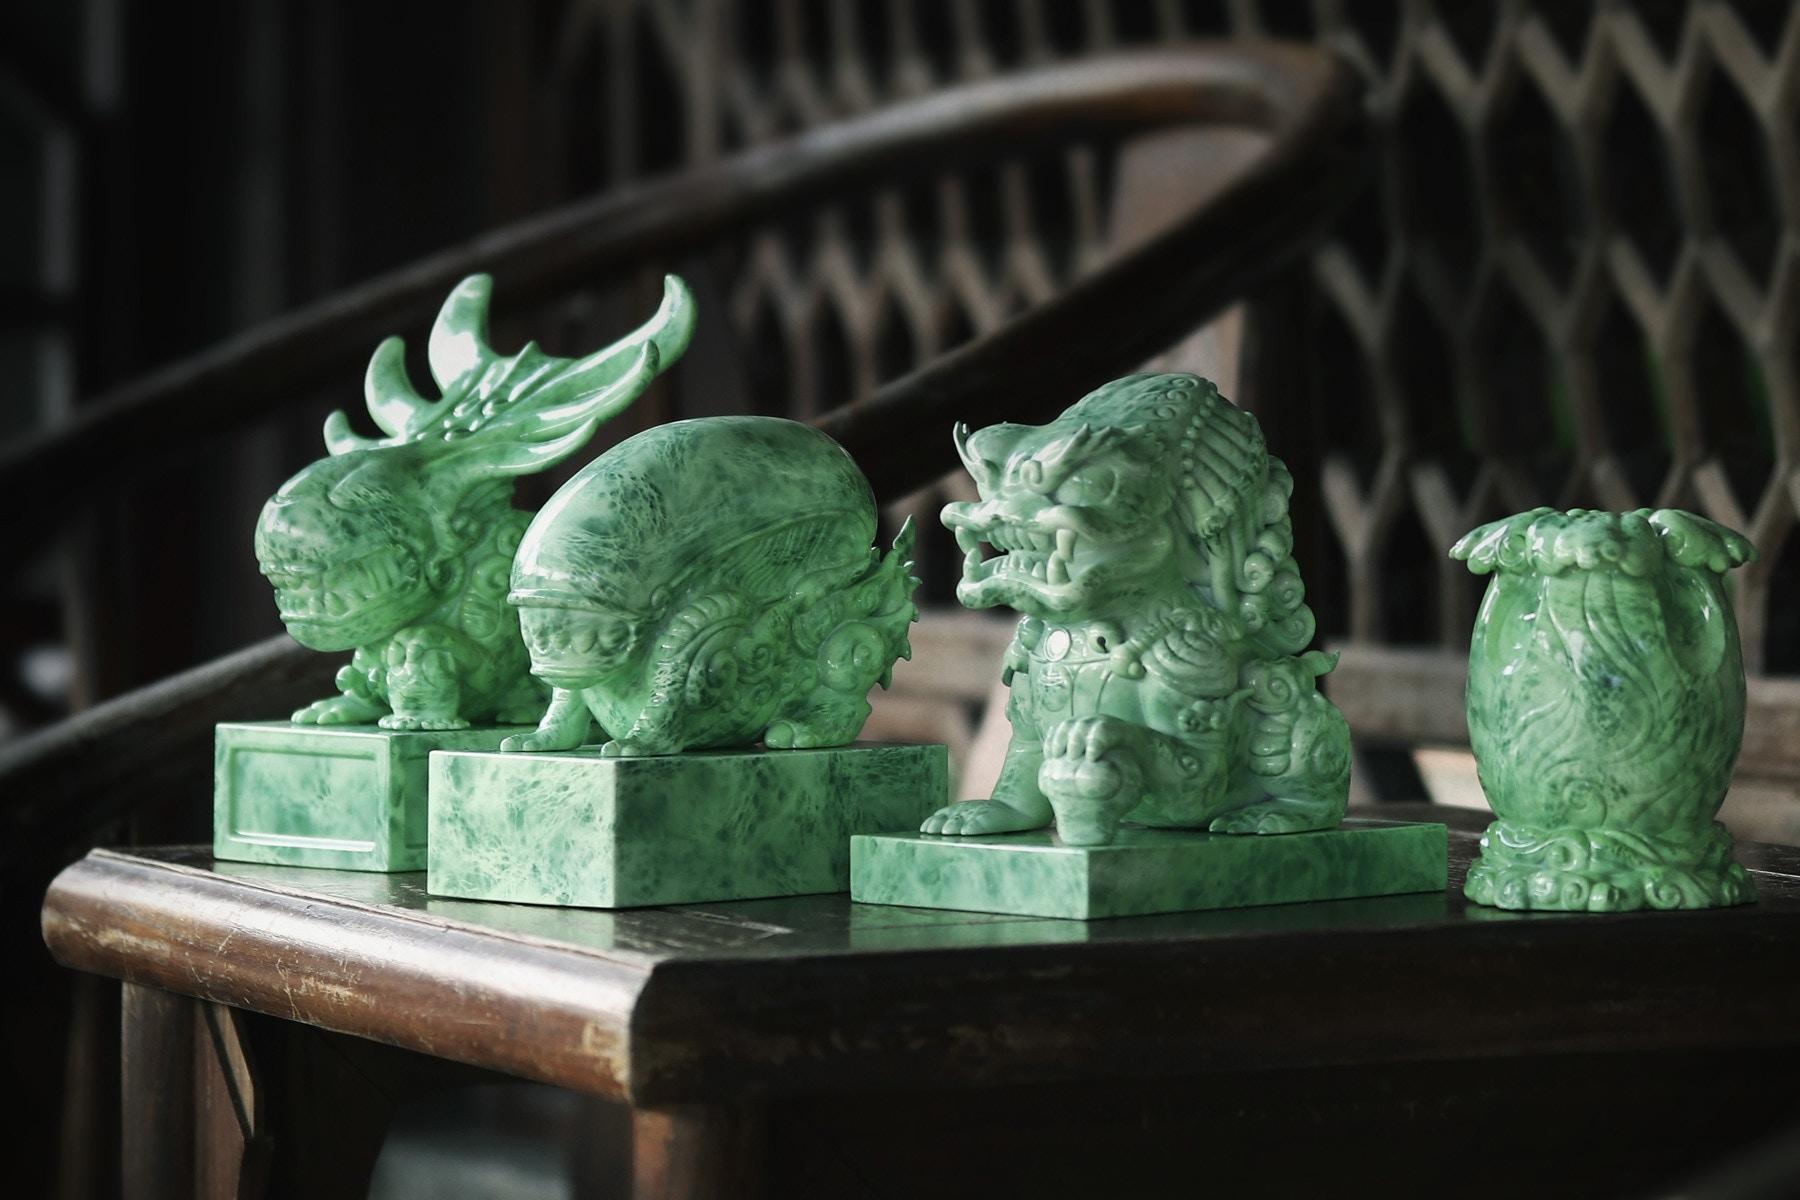 Cool 'Alien vs Predator' Jade-Like Figurines (6 pics)